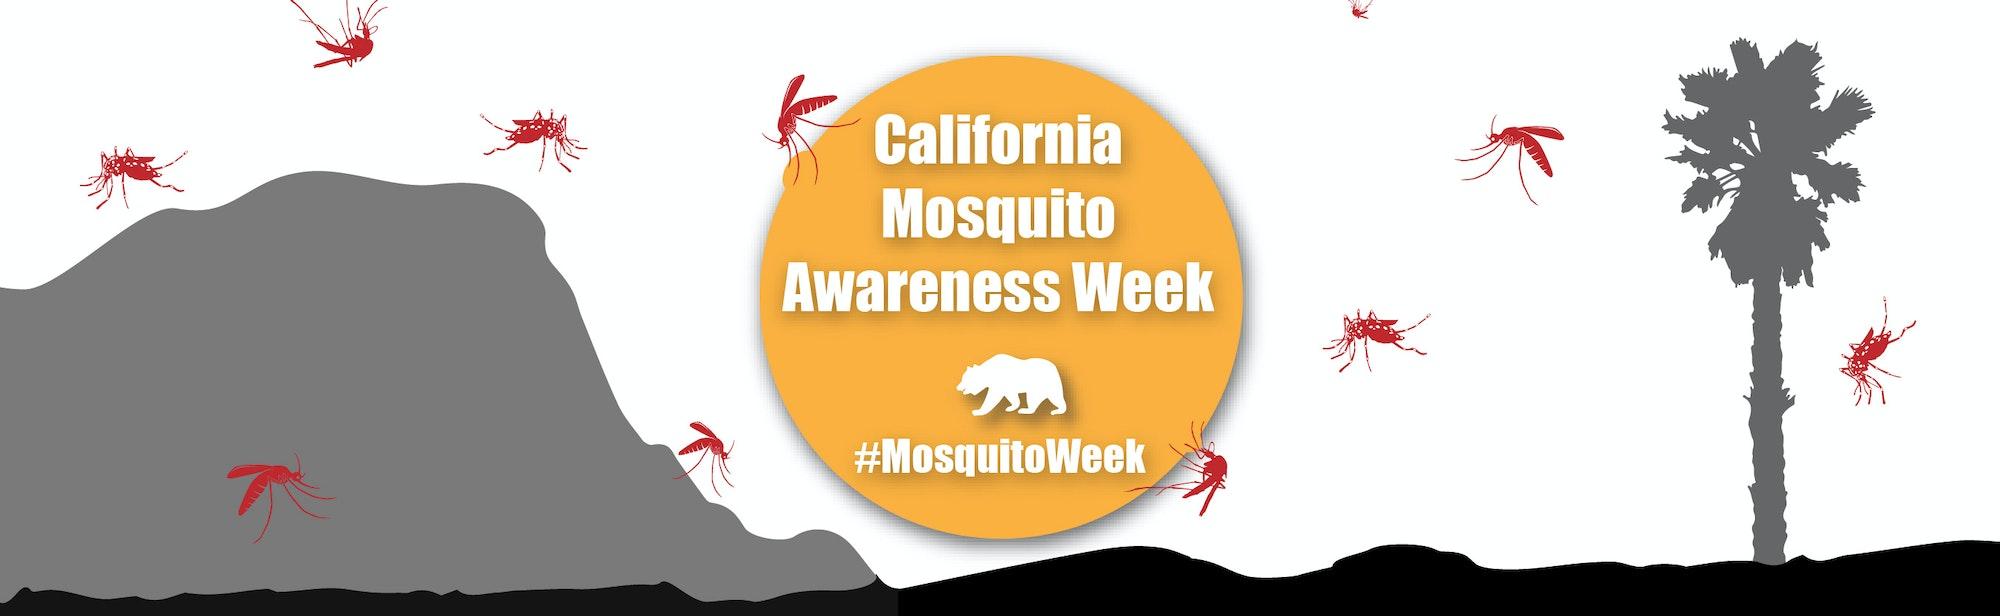 mosquito awareness week banner